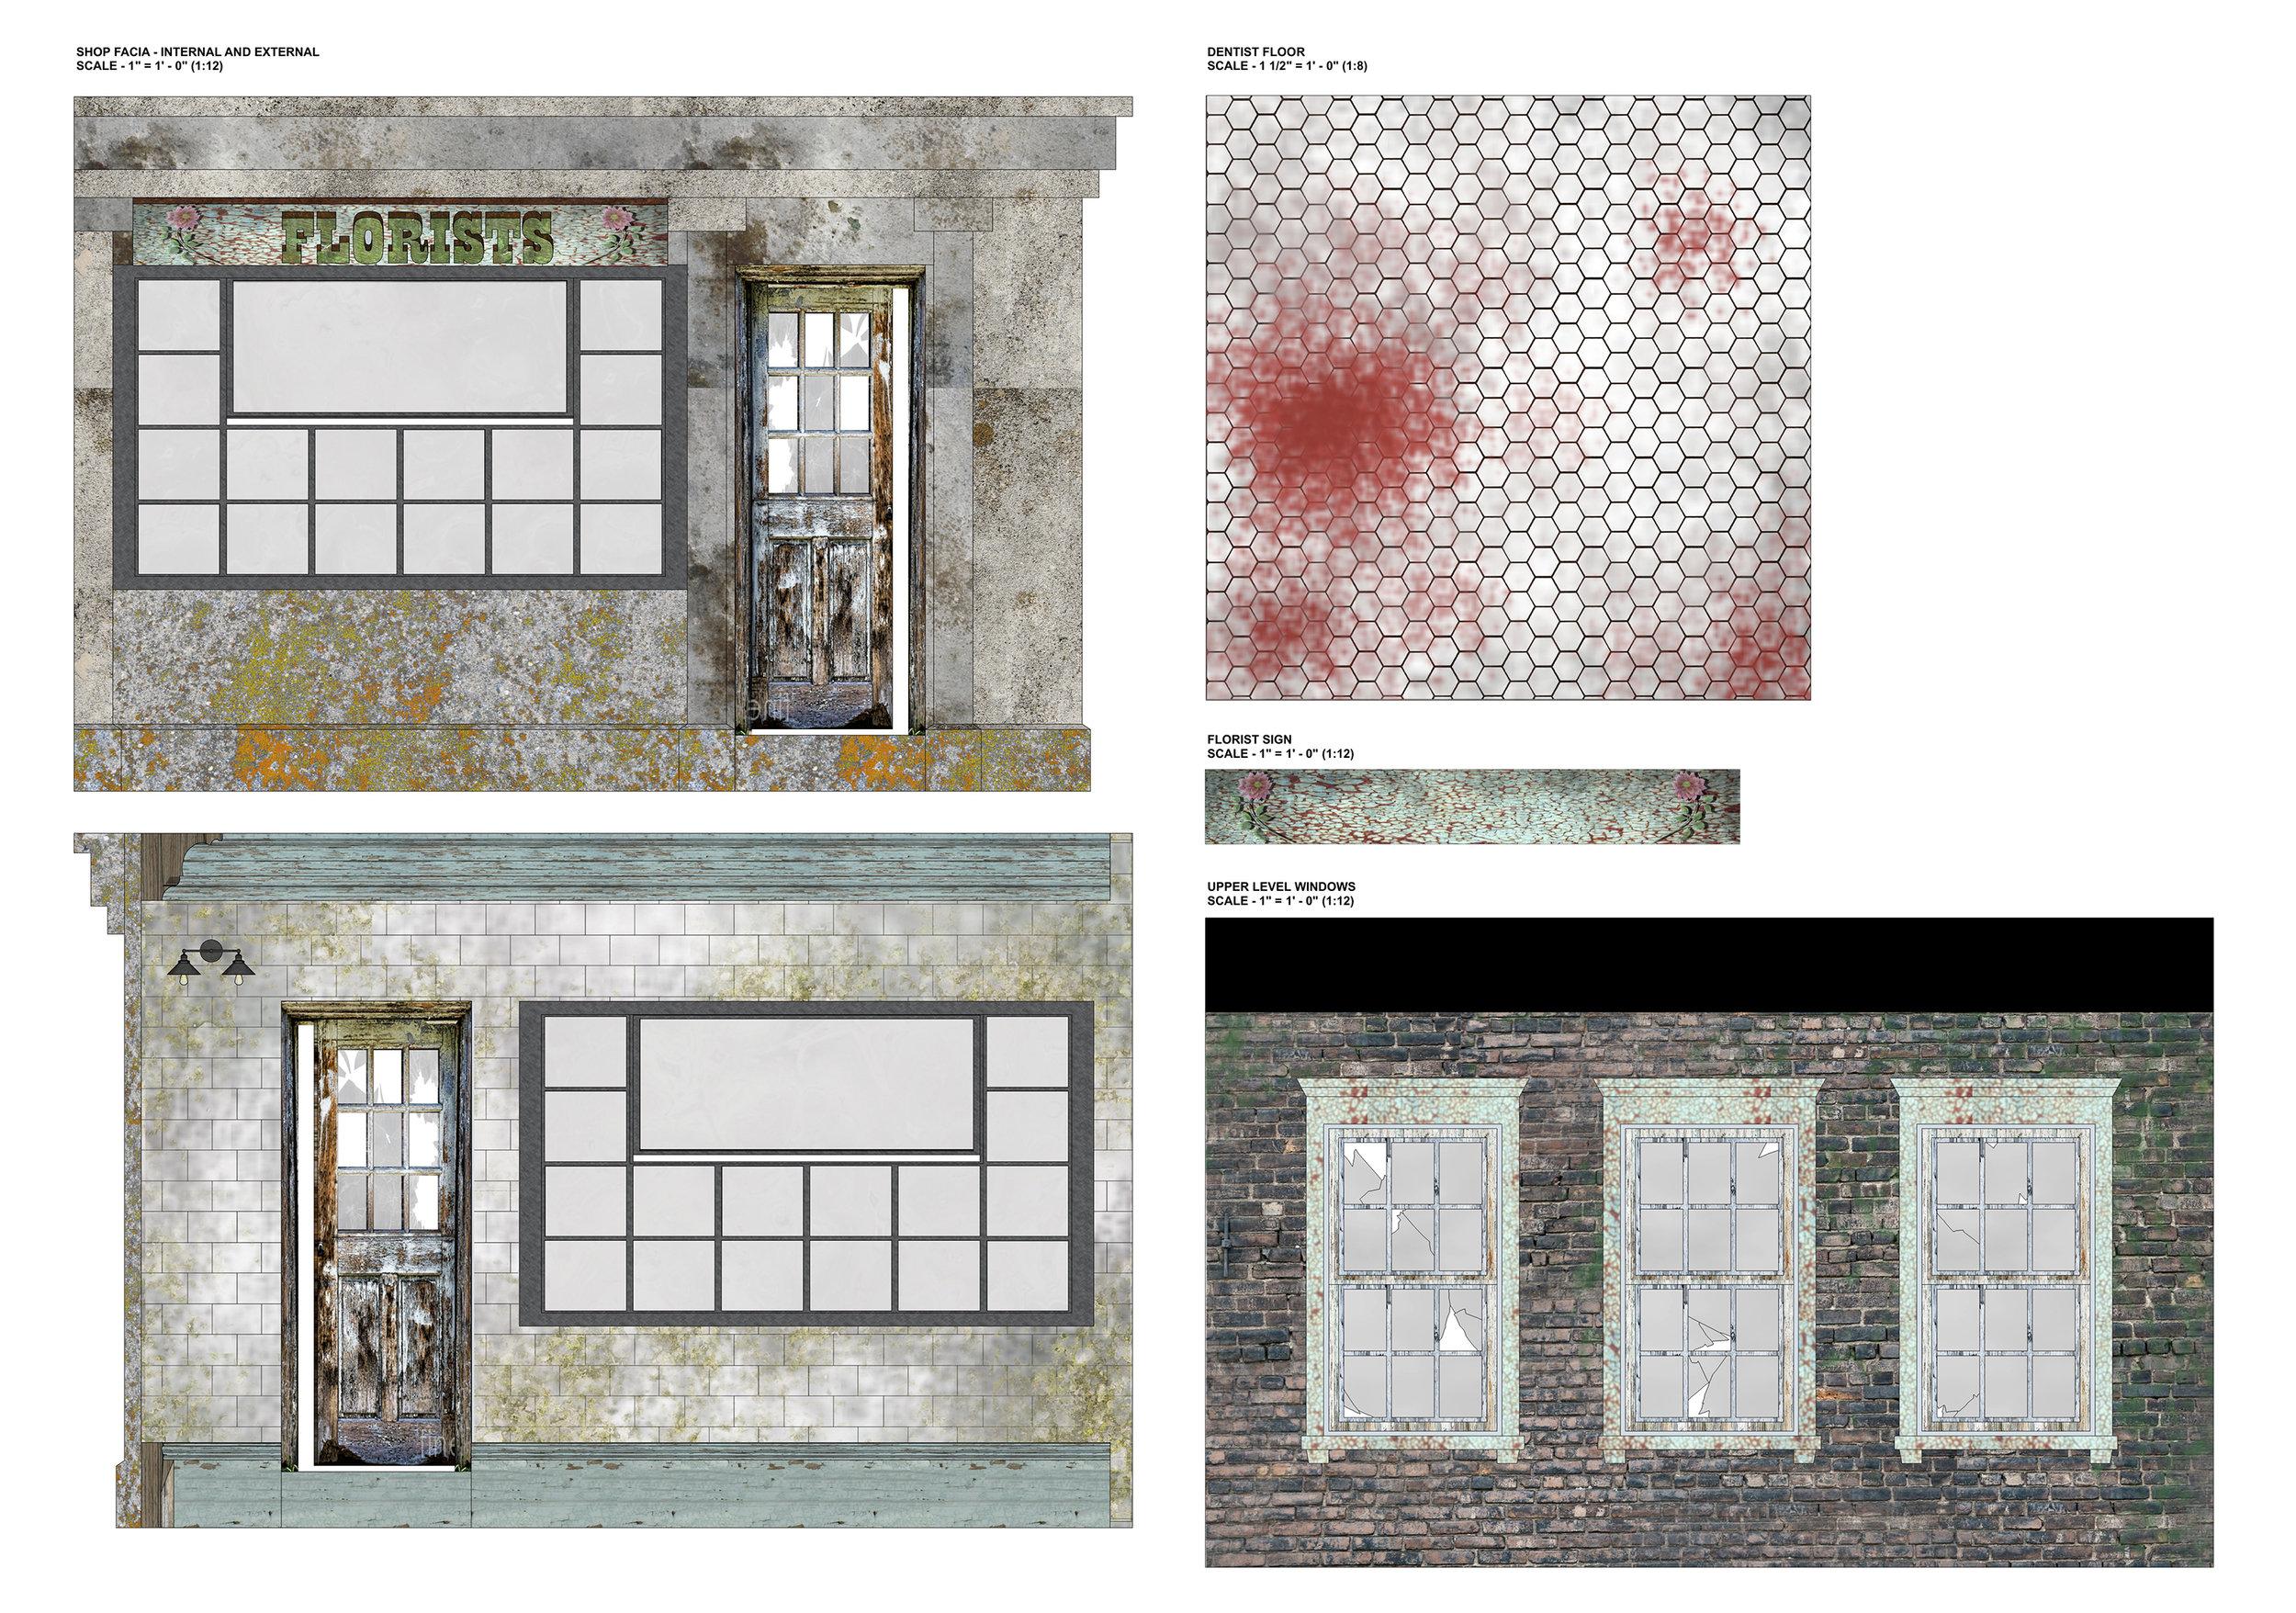 Shop Facia, Florist Sign, Dentist Floor and Window Wall Paint Elevations.jpg